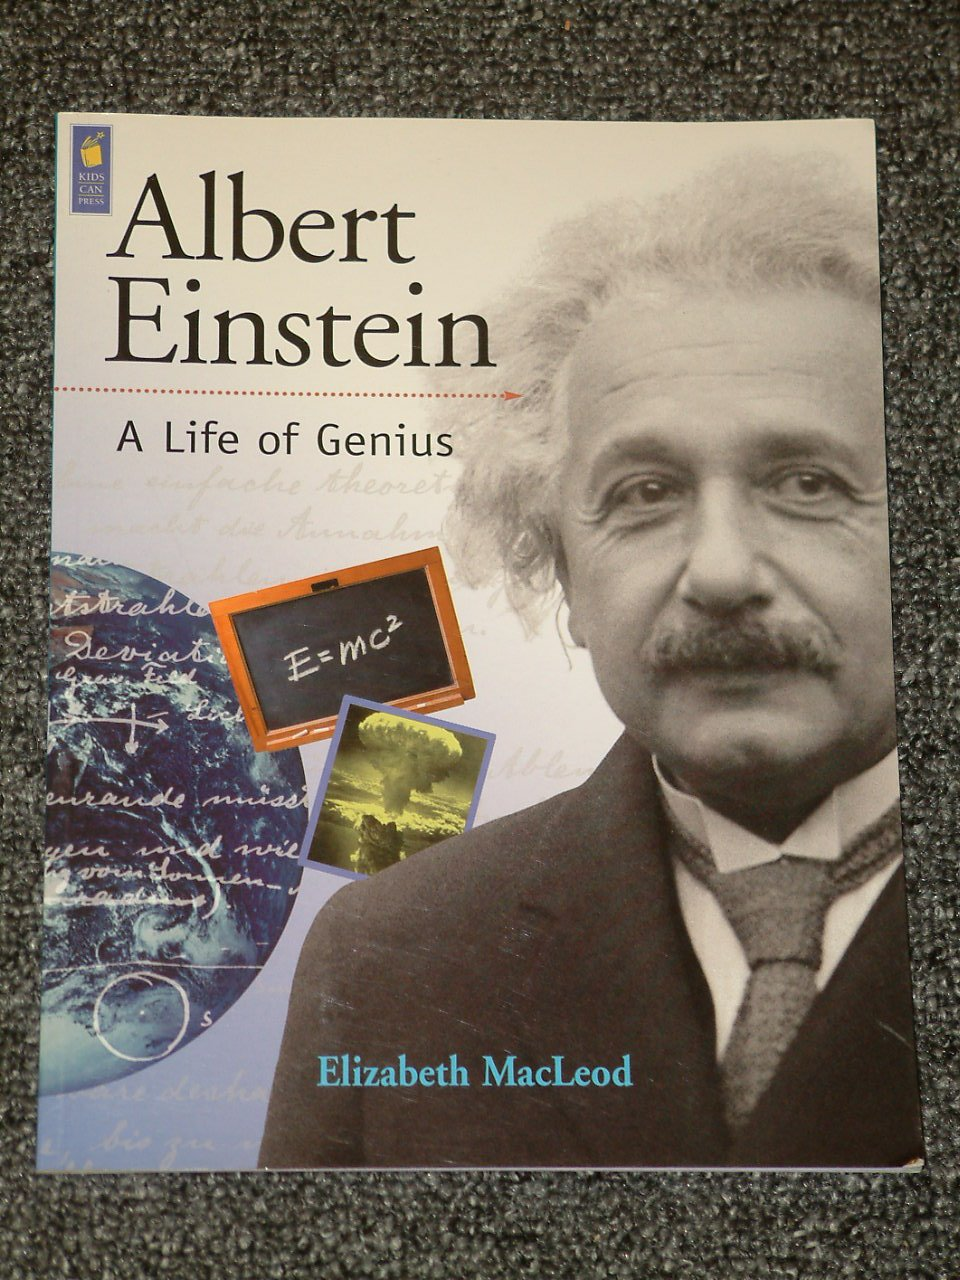 Albert Einstein A Life of Genius by Elizabeth MacLeod